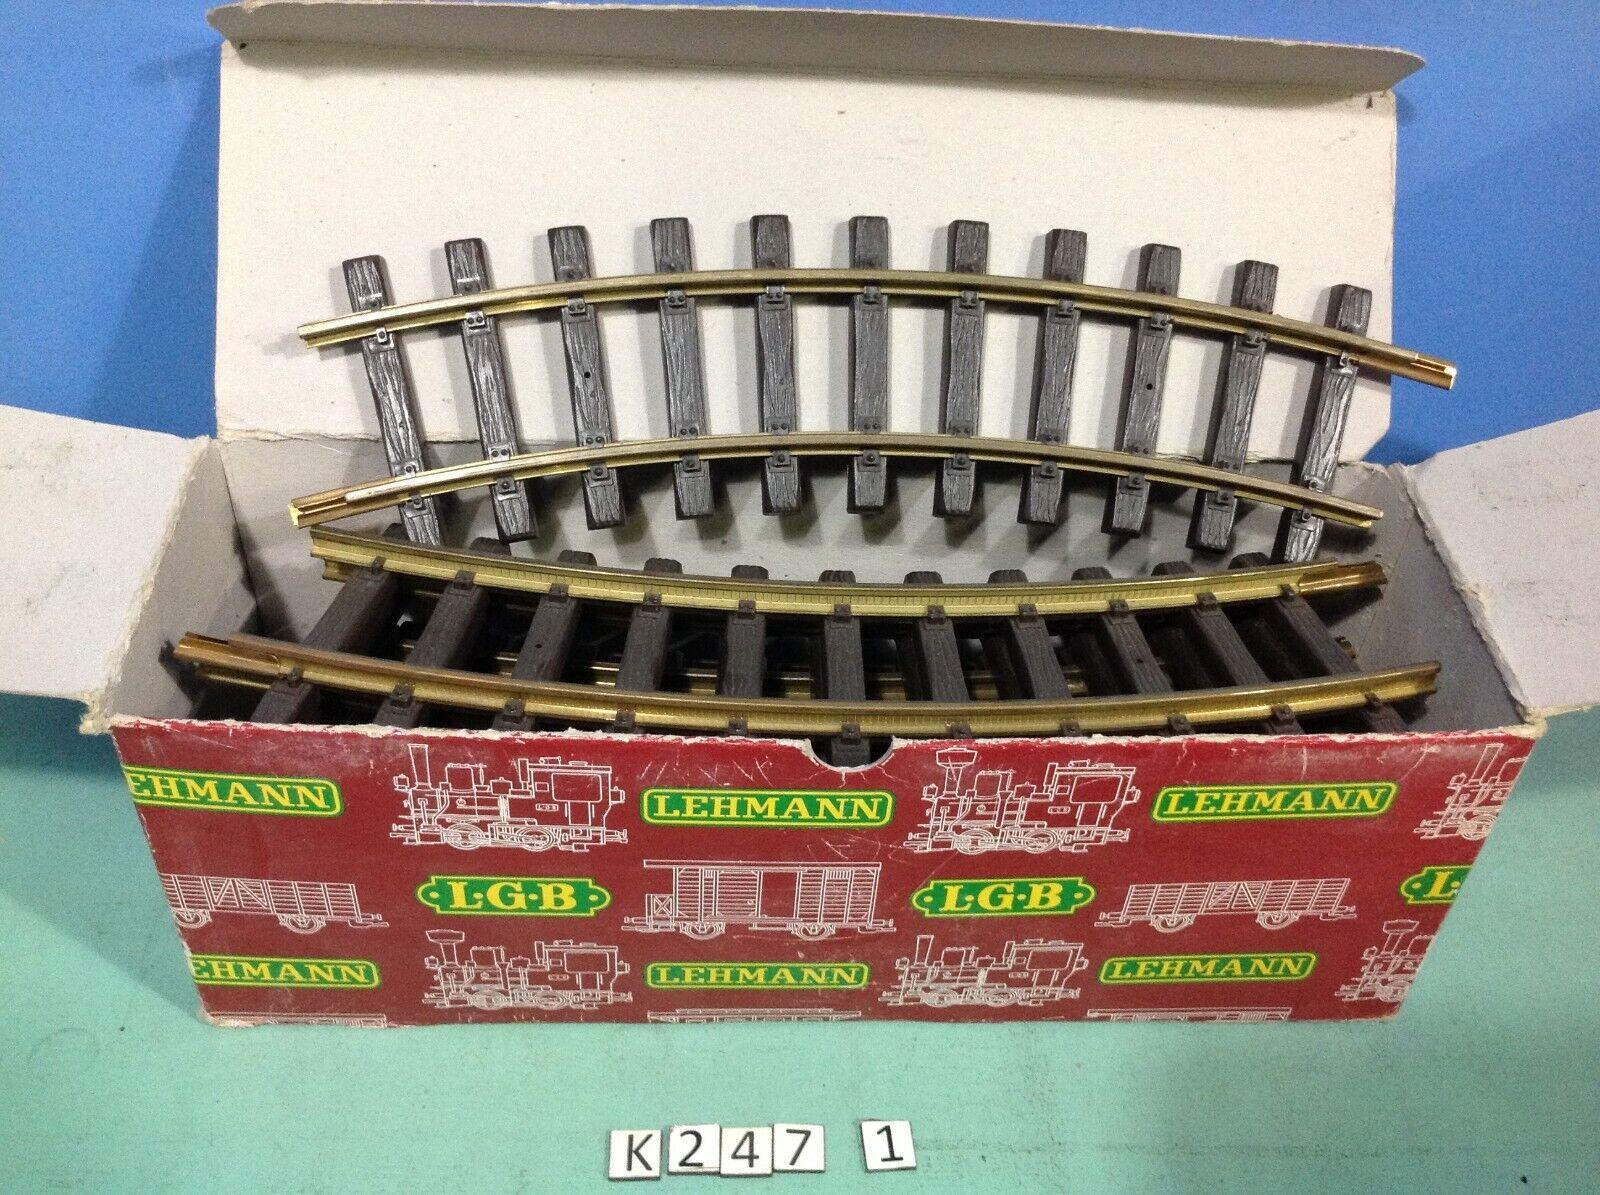 (K247.1) playmobil 10 rails courbes laiton LGB ref 1100 en boite